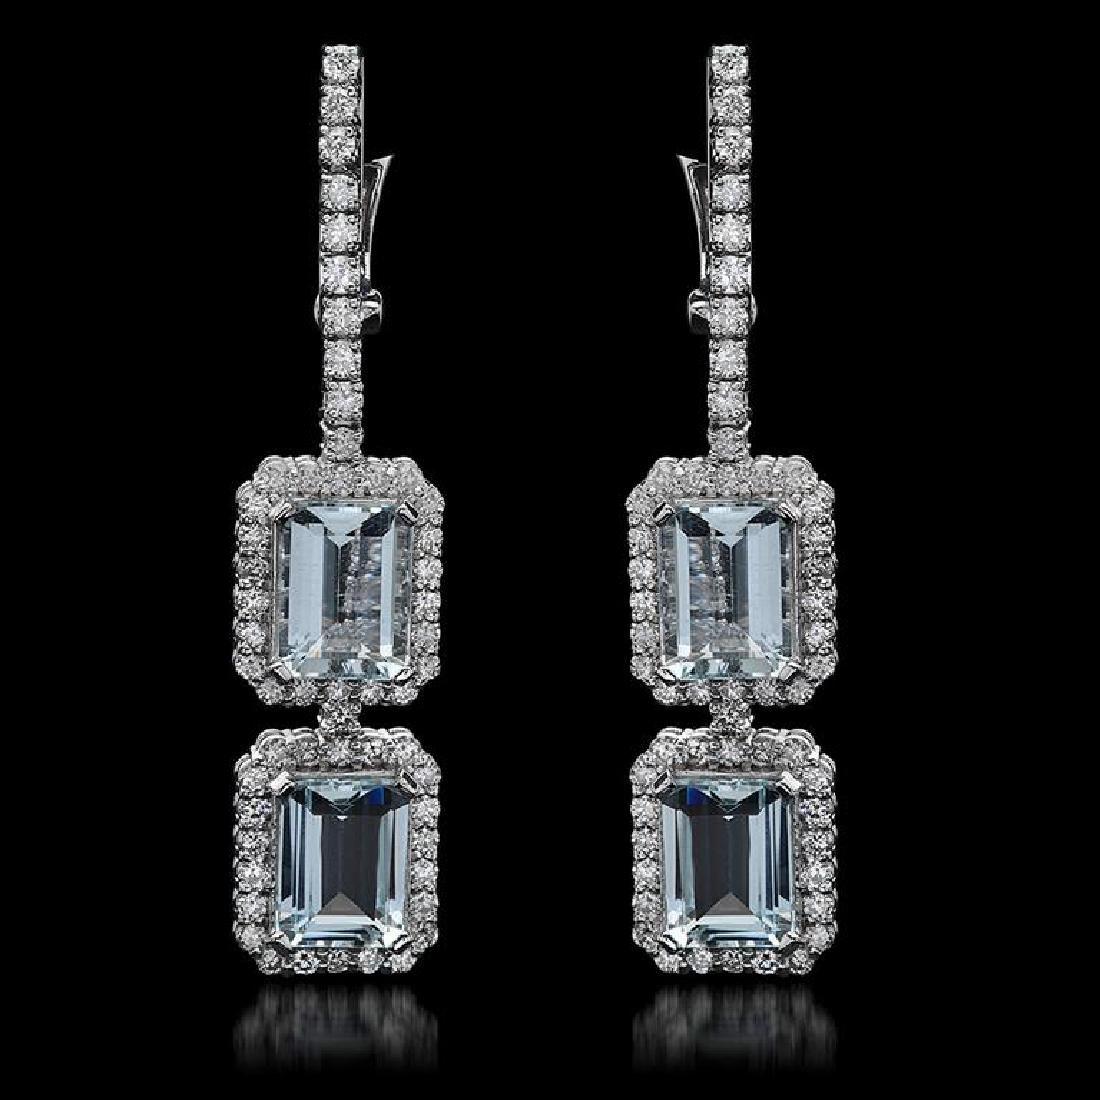 14k Gold 6.70ct Aquamarine & 2.15ct  Diamond Earrings